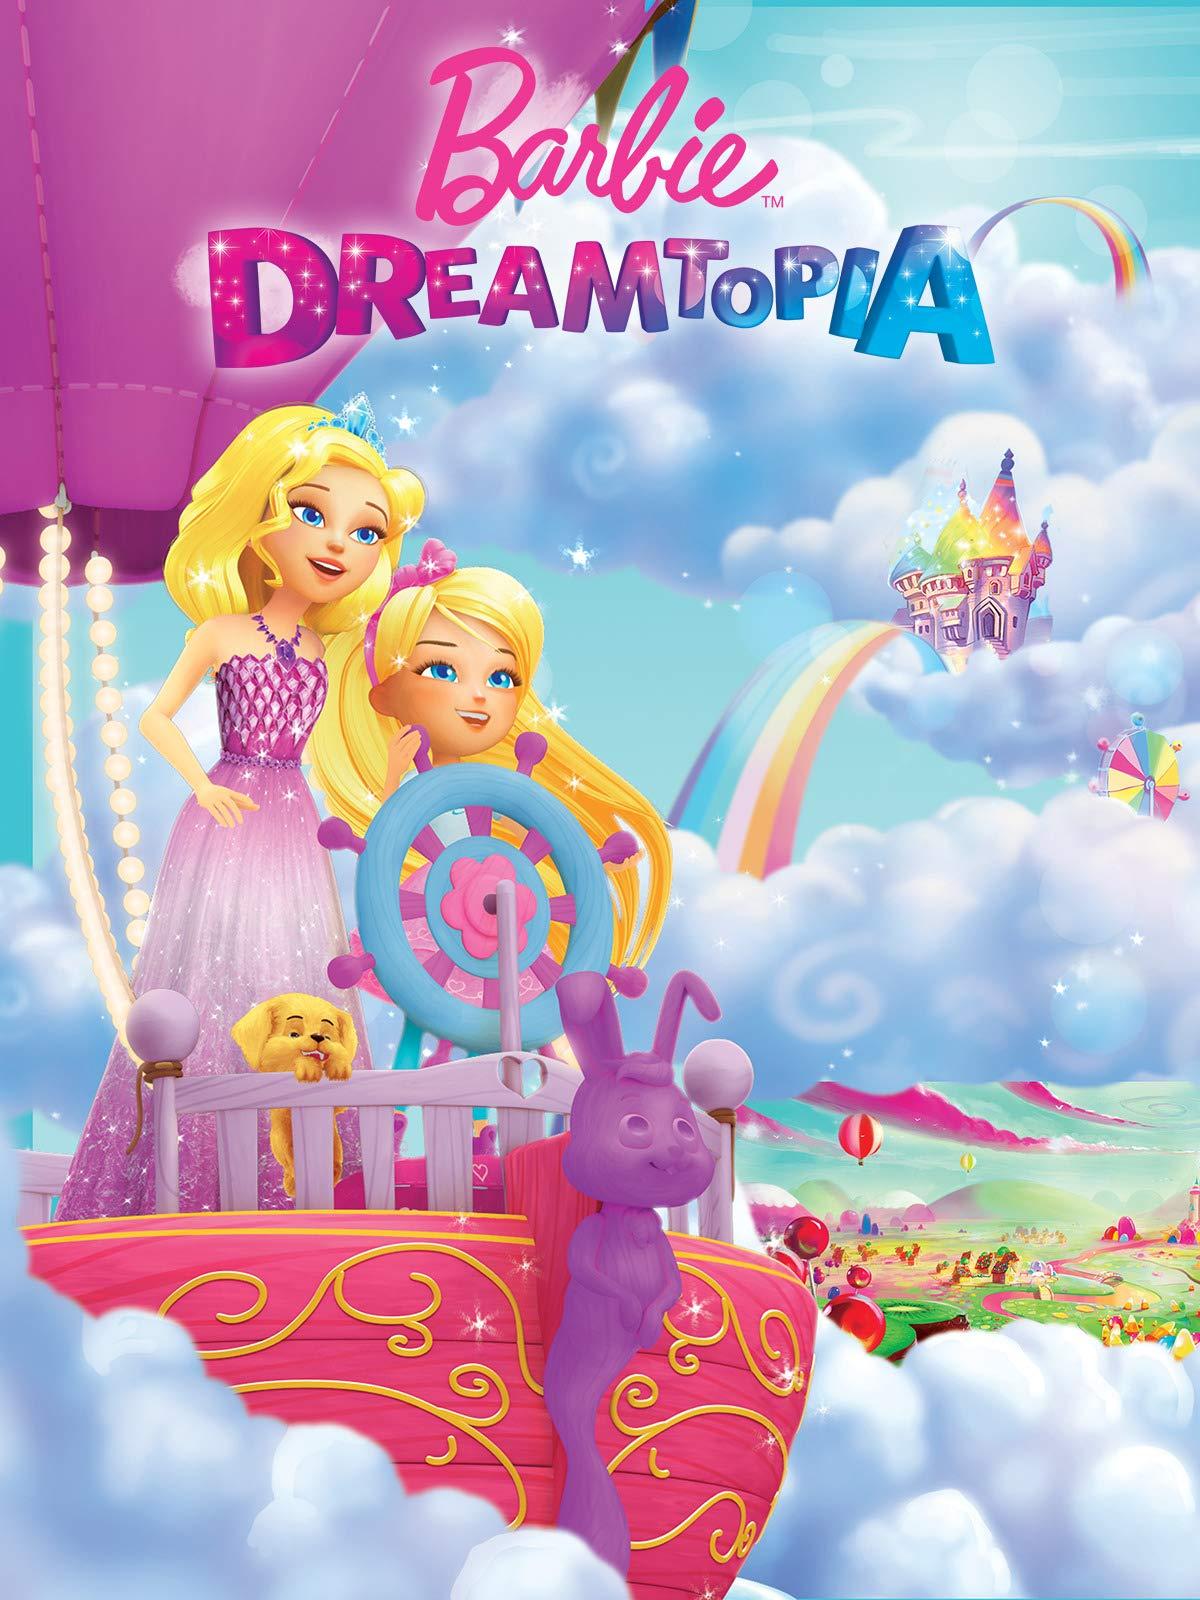 Barbie: Dreamtopia Special (English) on Amazon Prime Video UK